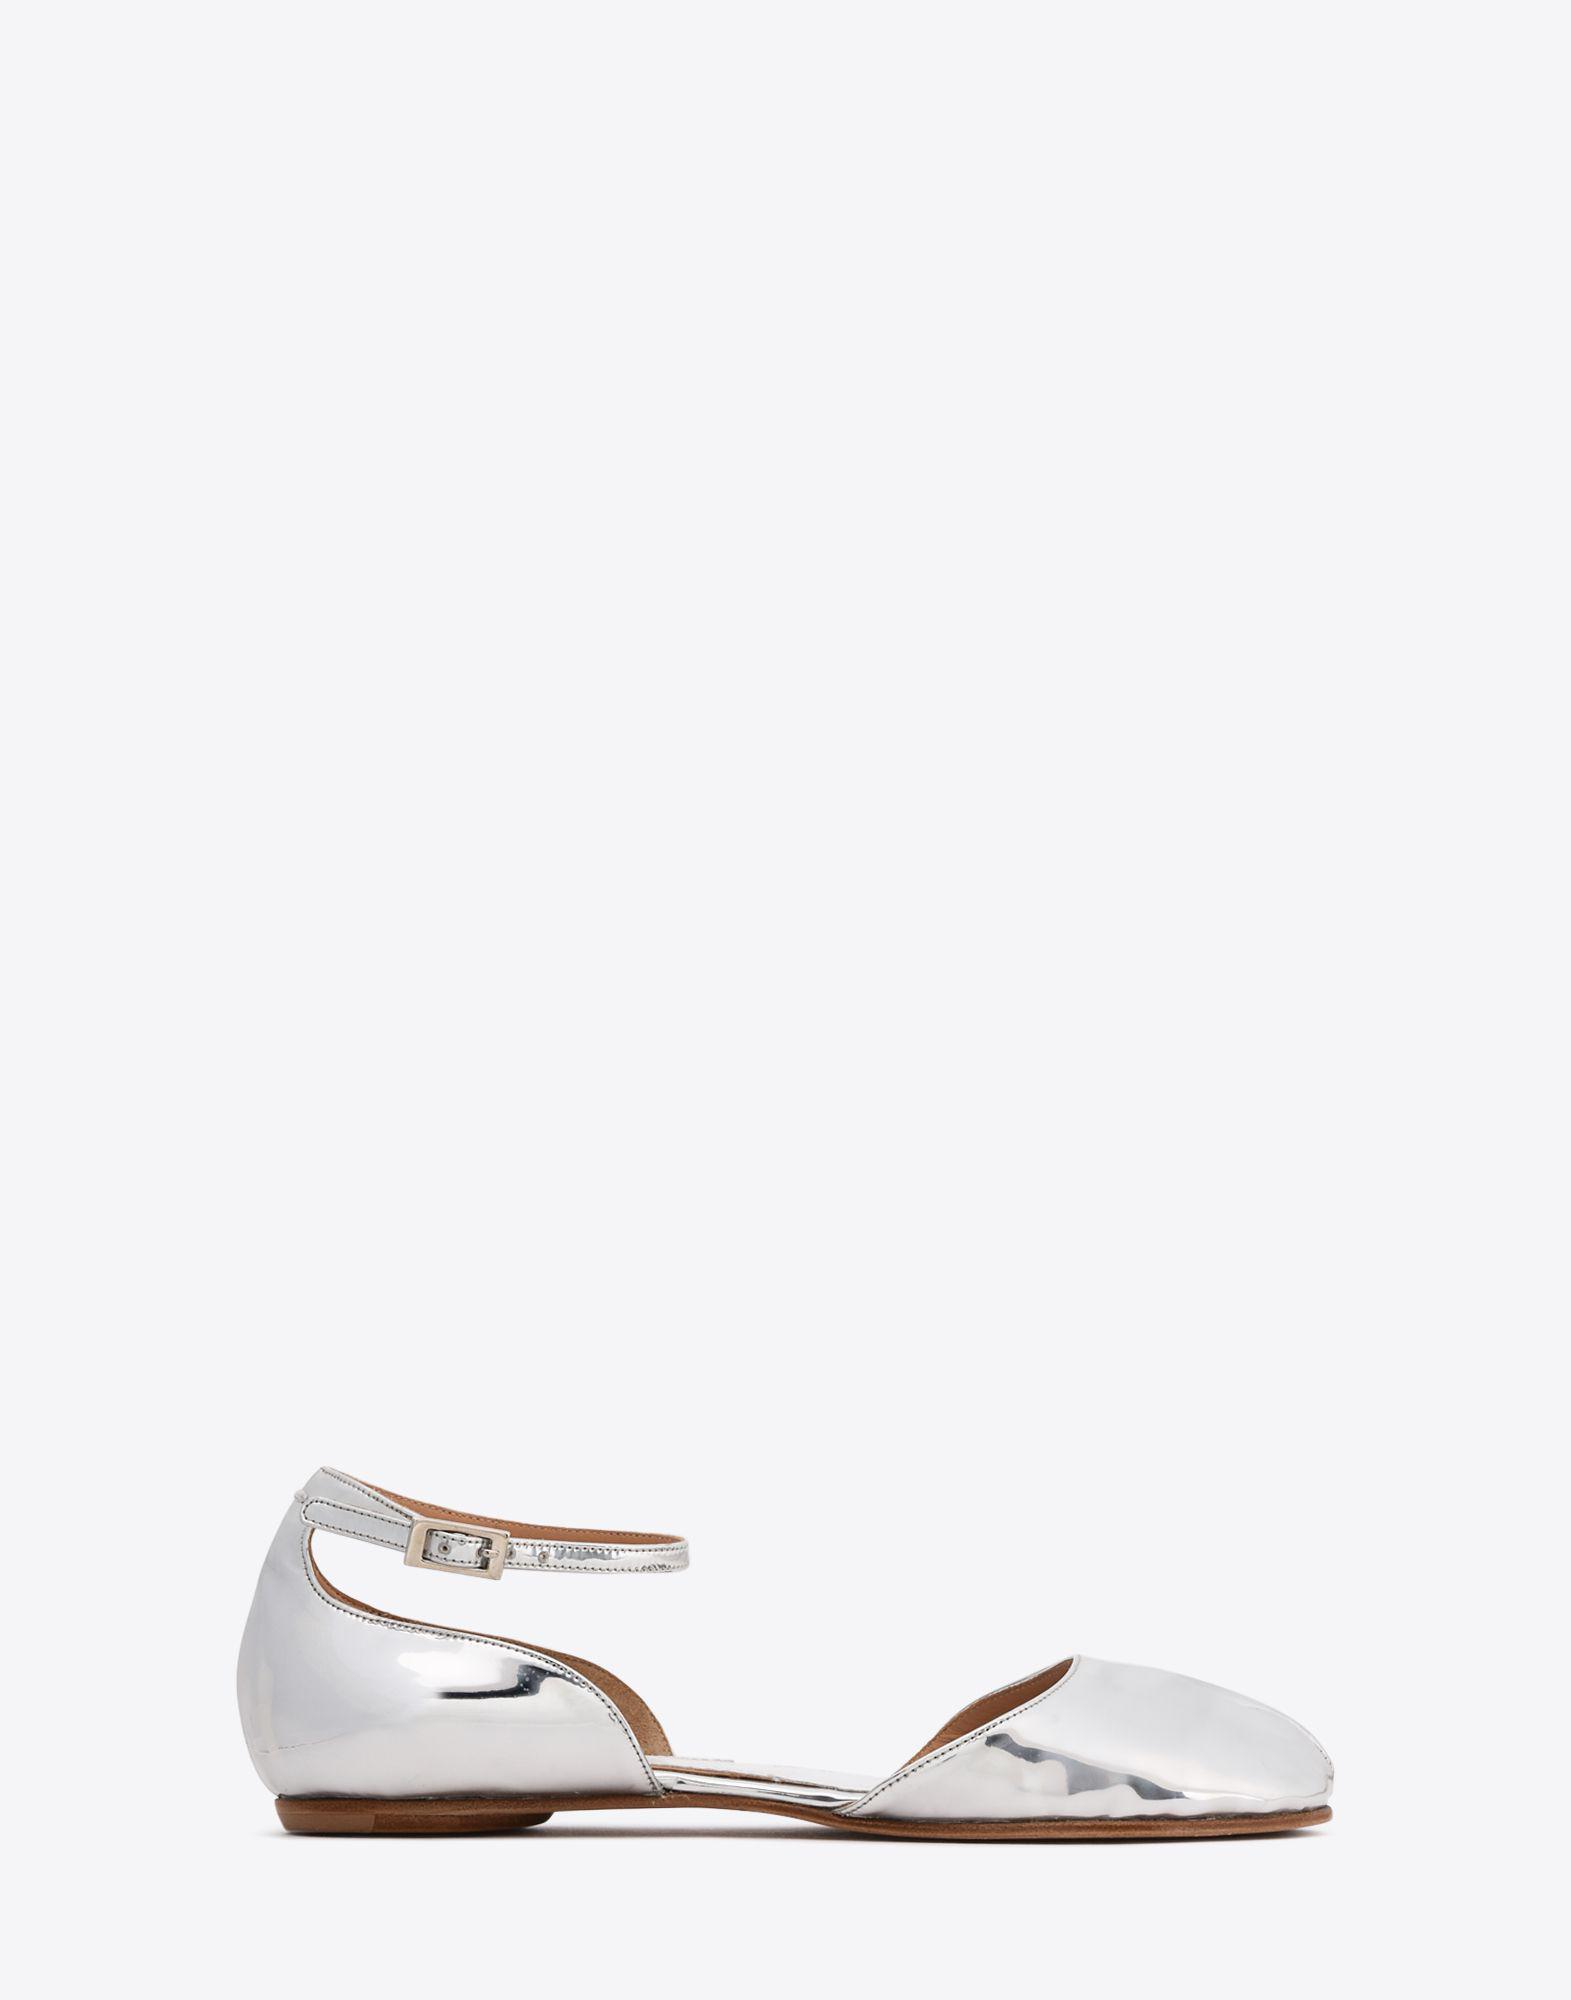 f4c7ec155f72 Lyst - Maison Margiela Metallic Tabi Flats With Ankle Straps in Metallic